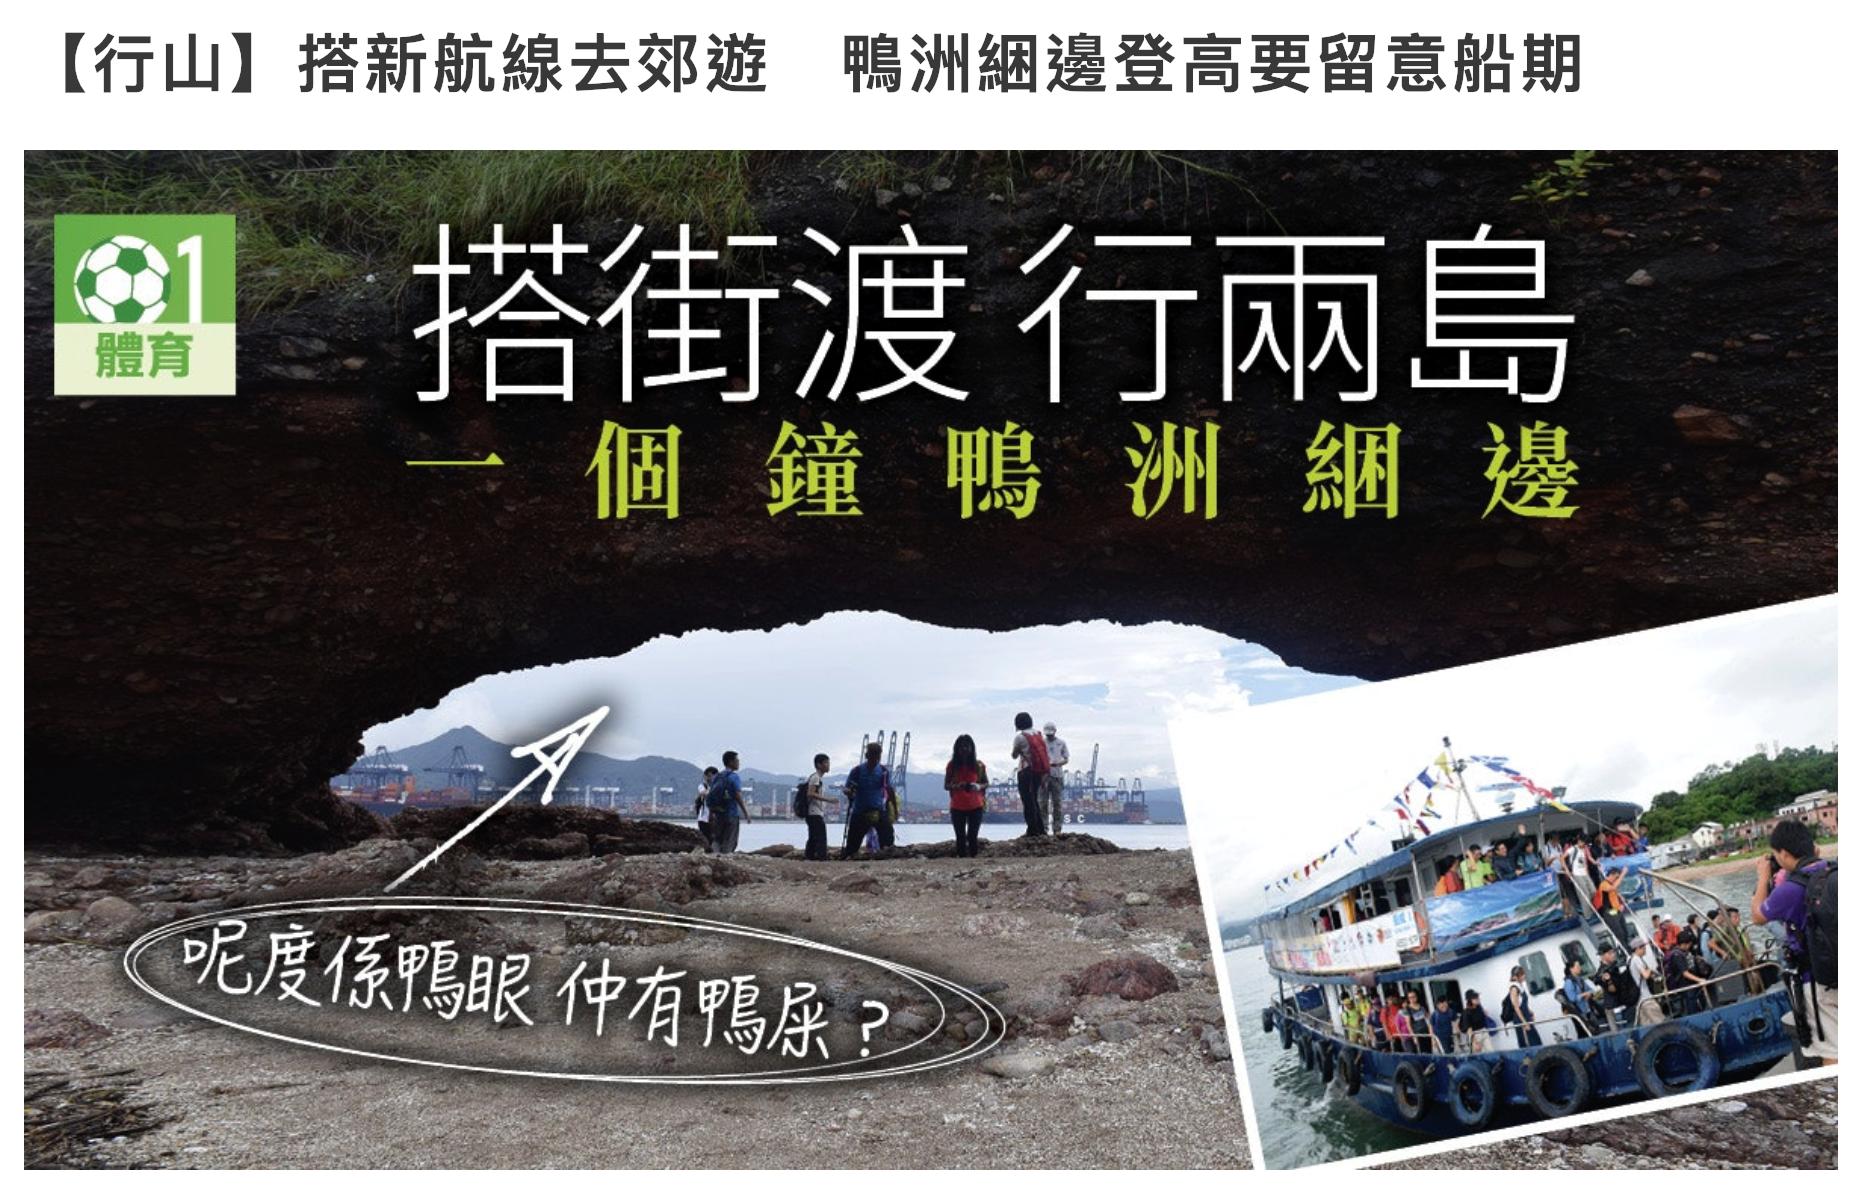 [2018.09.03]HK01--【行山】搭新航線去郊遊 鴨洲綑邊登高